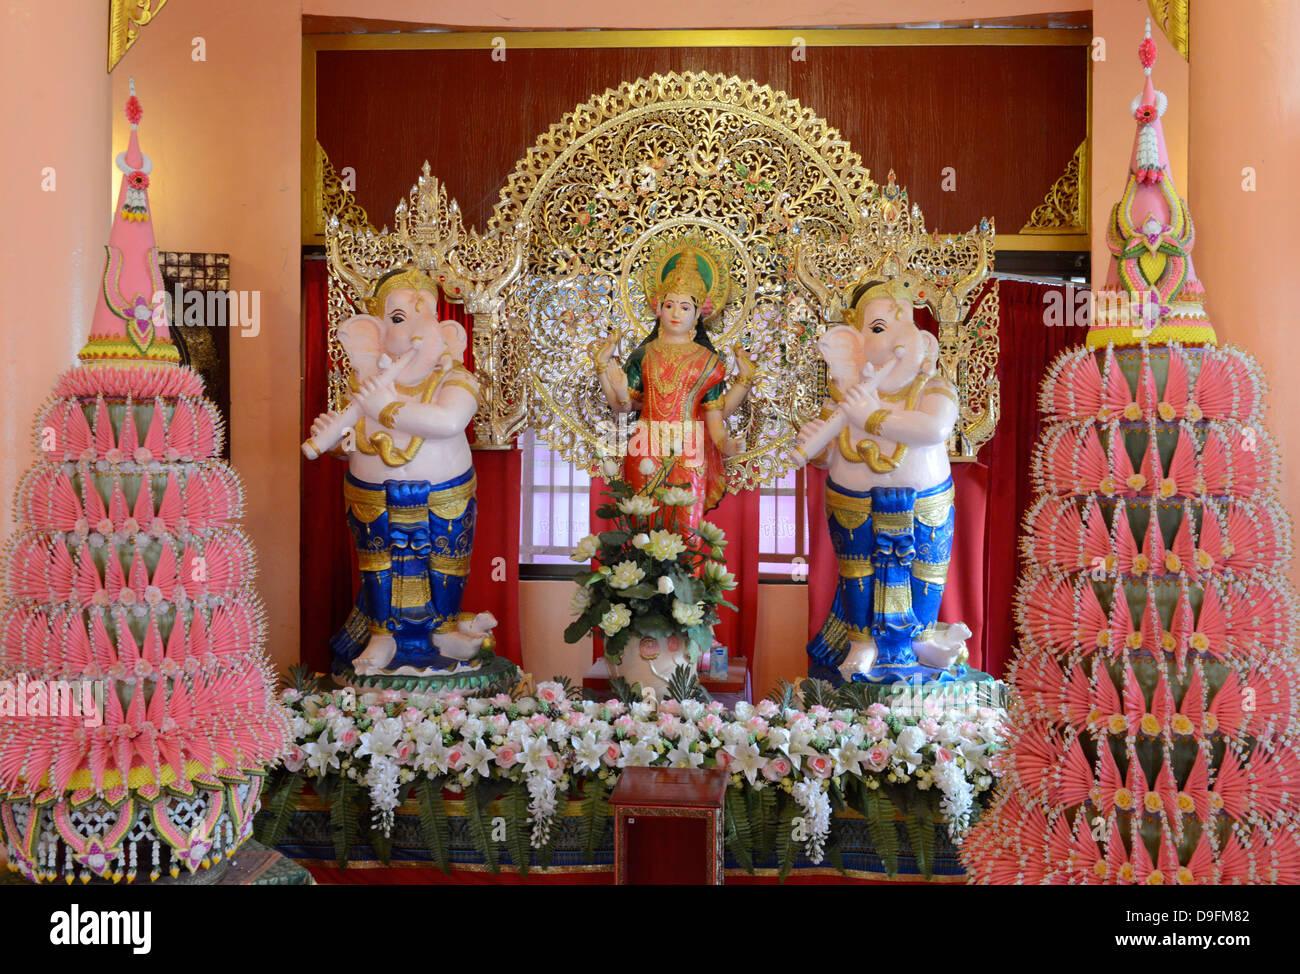 Lakshmi shrine, Wat Doi Wao, Mae Sai, Thailand, Southeast Asia - Stock Image